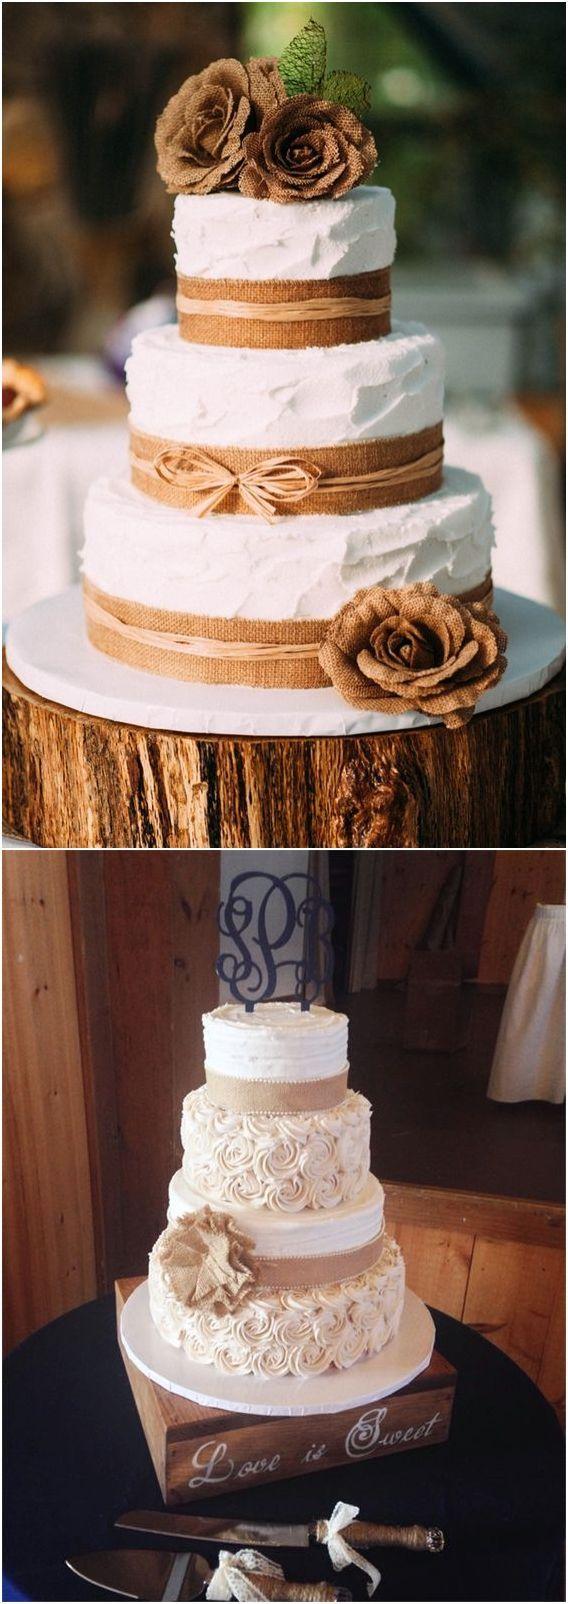 rustic burlap wedding cakes  #wedding #weddingideas #weddingcakes #cakes